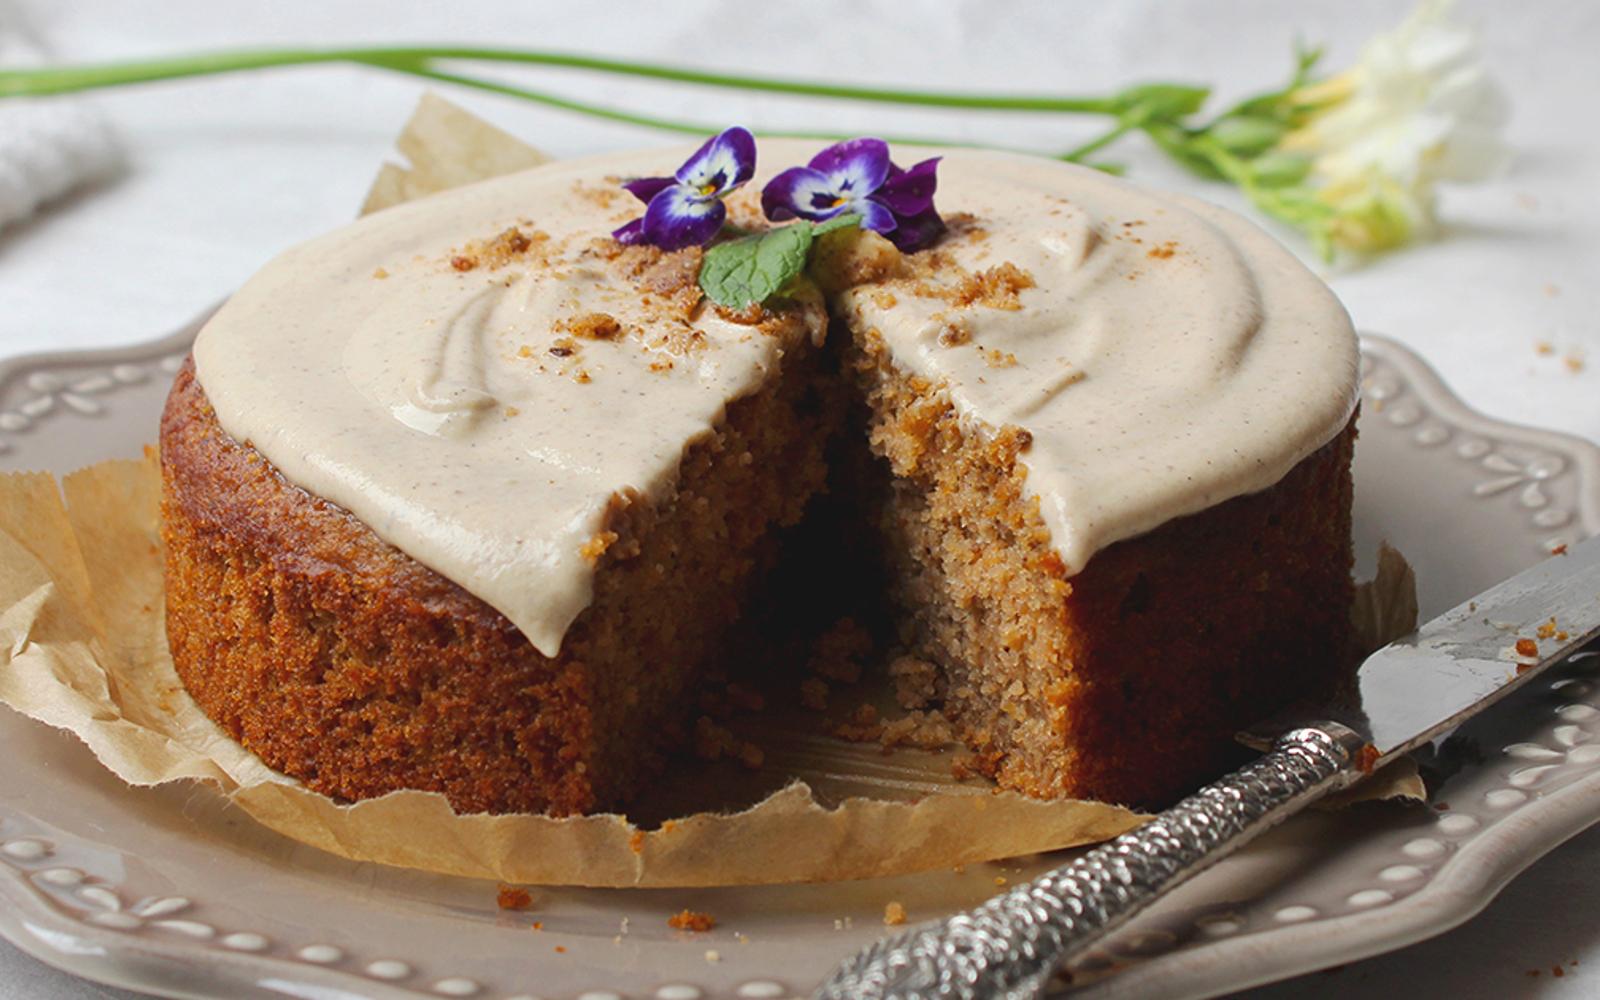 Carrot Cake Made With Buckwheat Flour